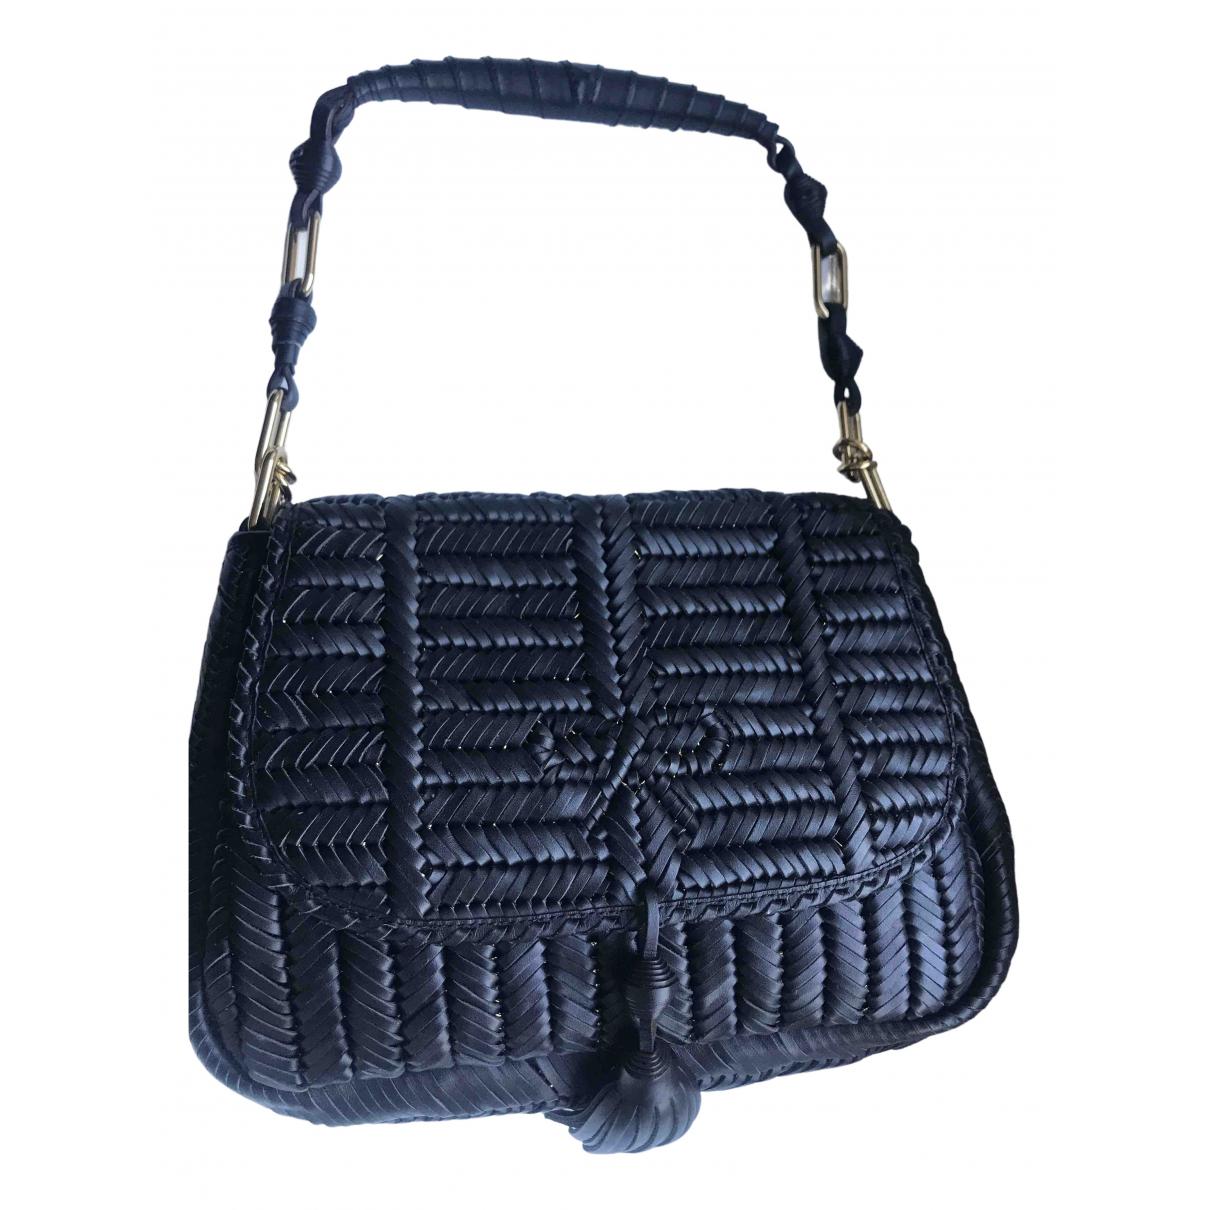 Anya Hindmarch Pimlico Black Leather handbag for Women \N